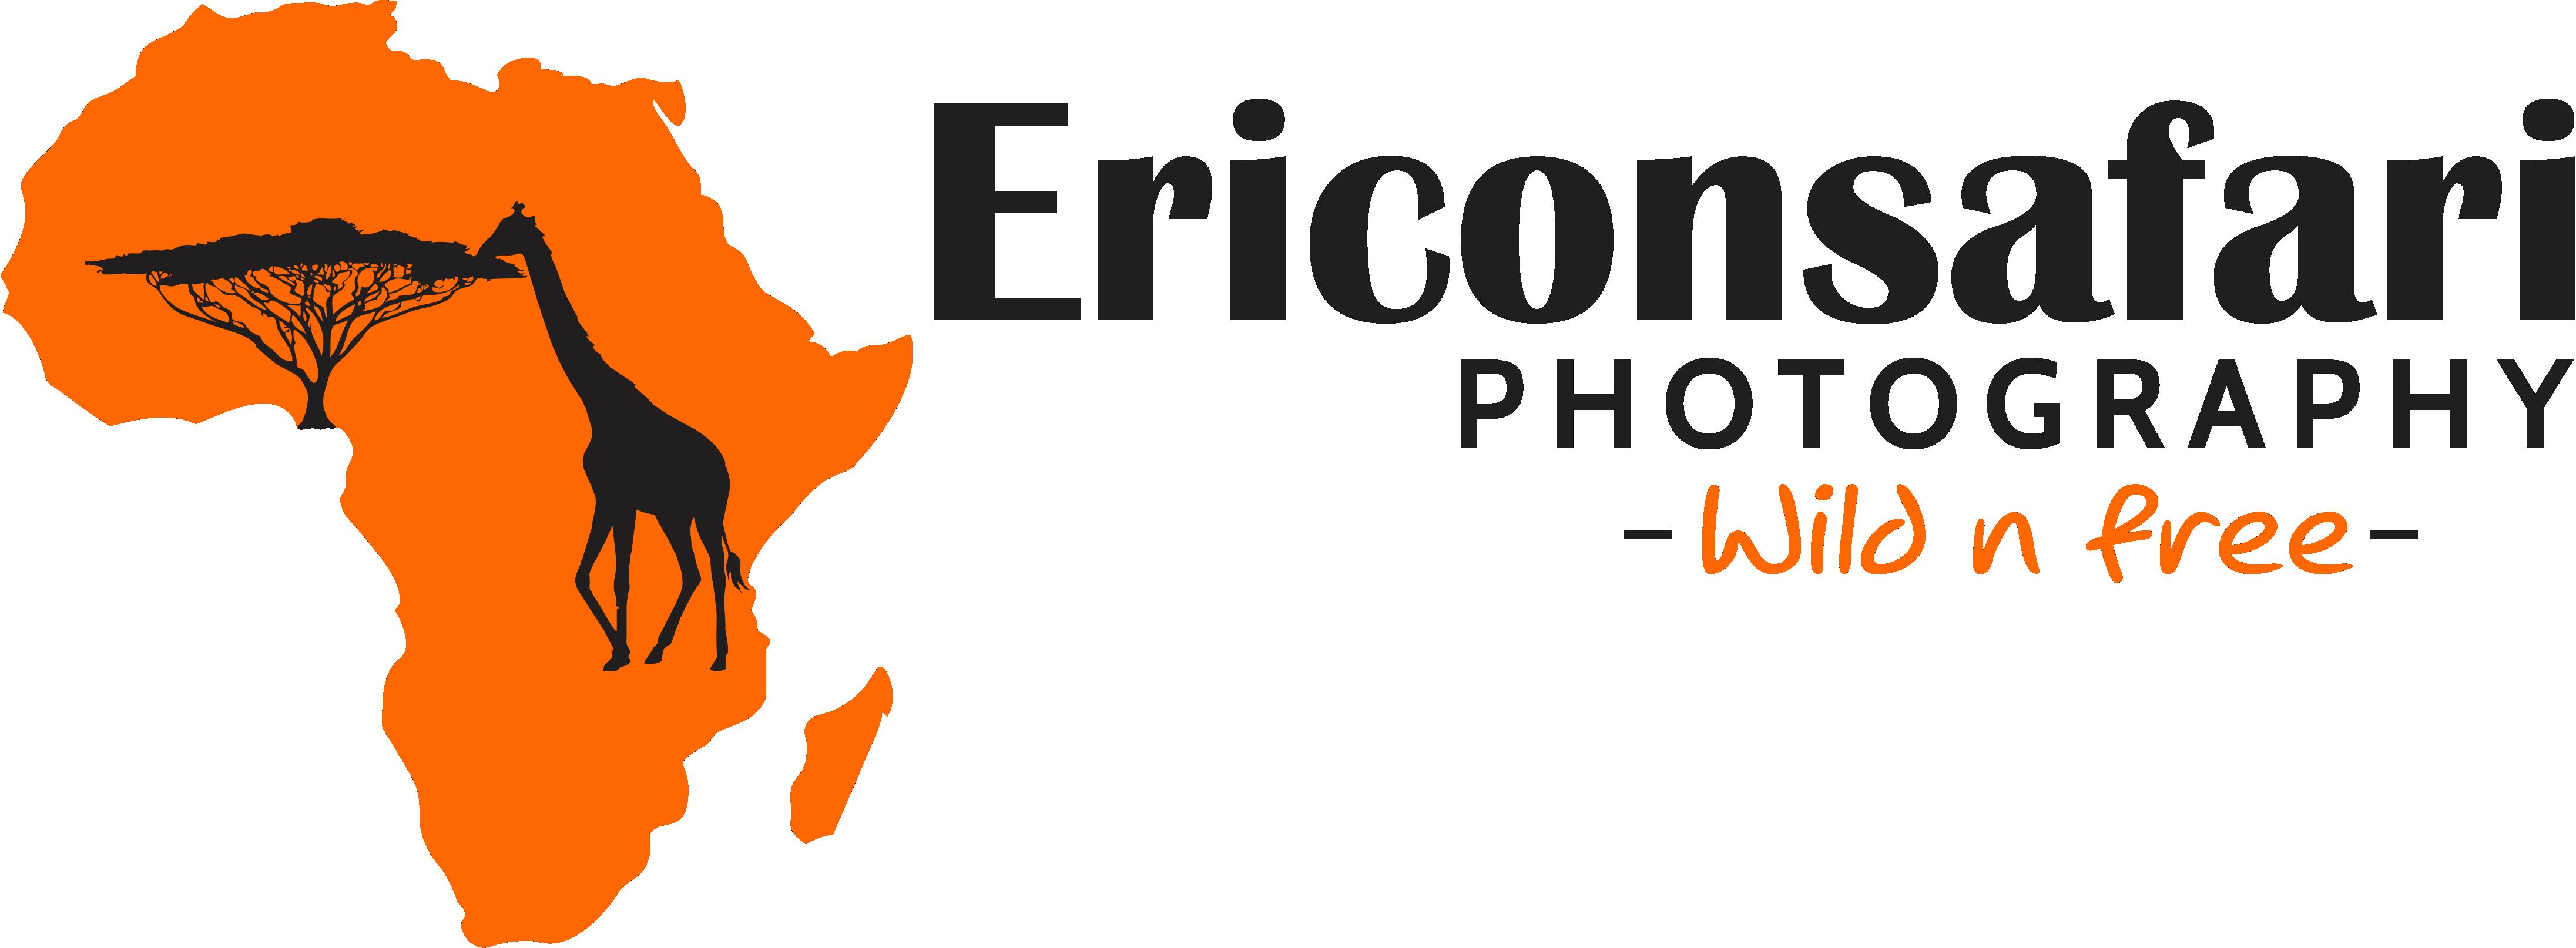 Ericonsafari Photography